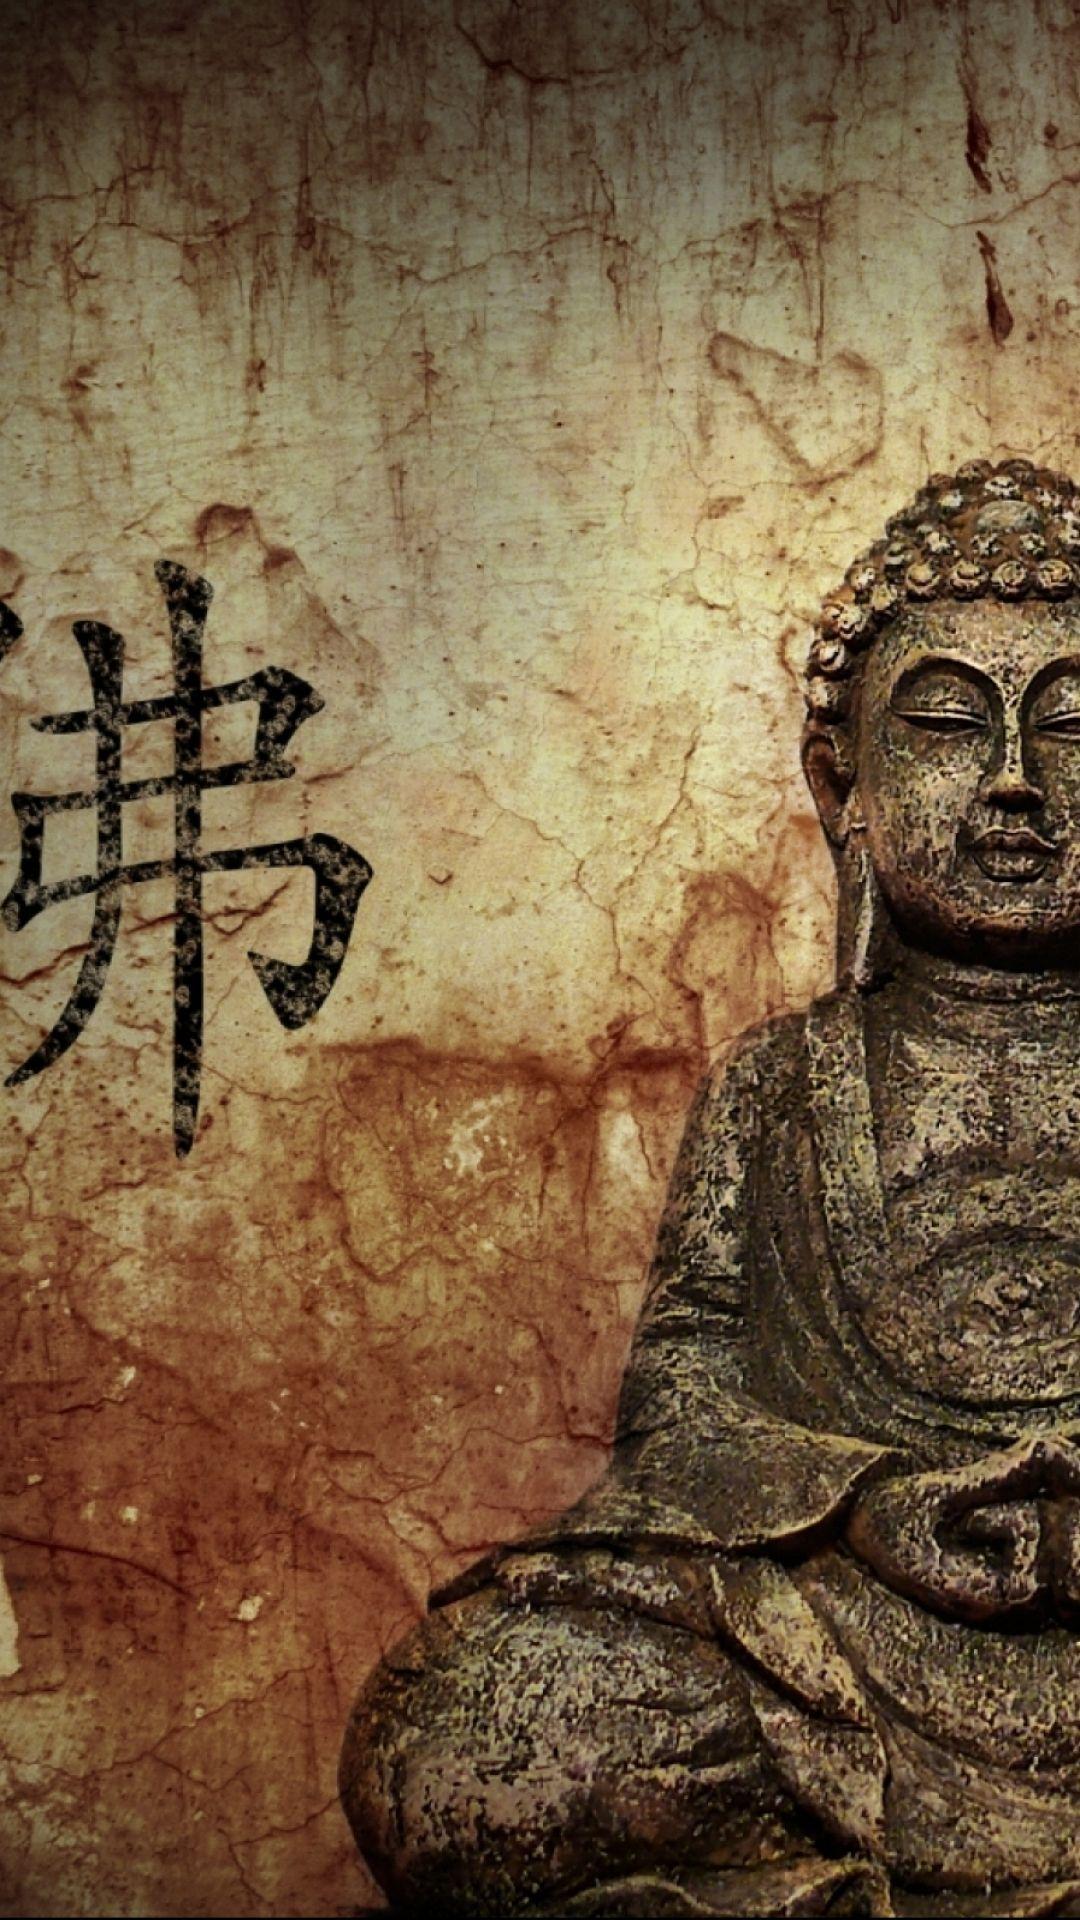 Epingle Par Leticia Ring Sur Wallpapers Fondos De Pantalla Etc En 2020 Fond D Ecran Telephone Fond Ecran Zen Bouddha